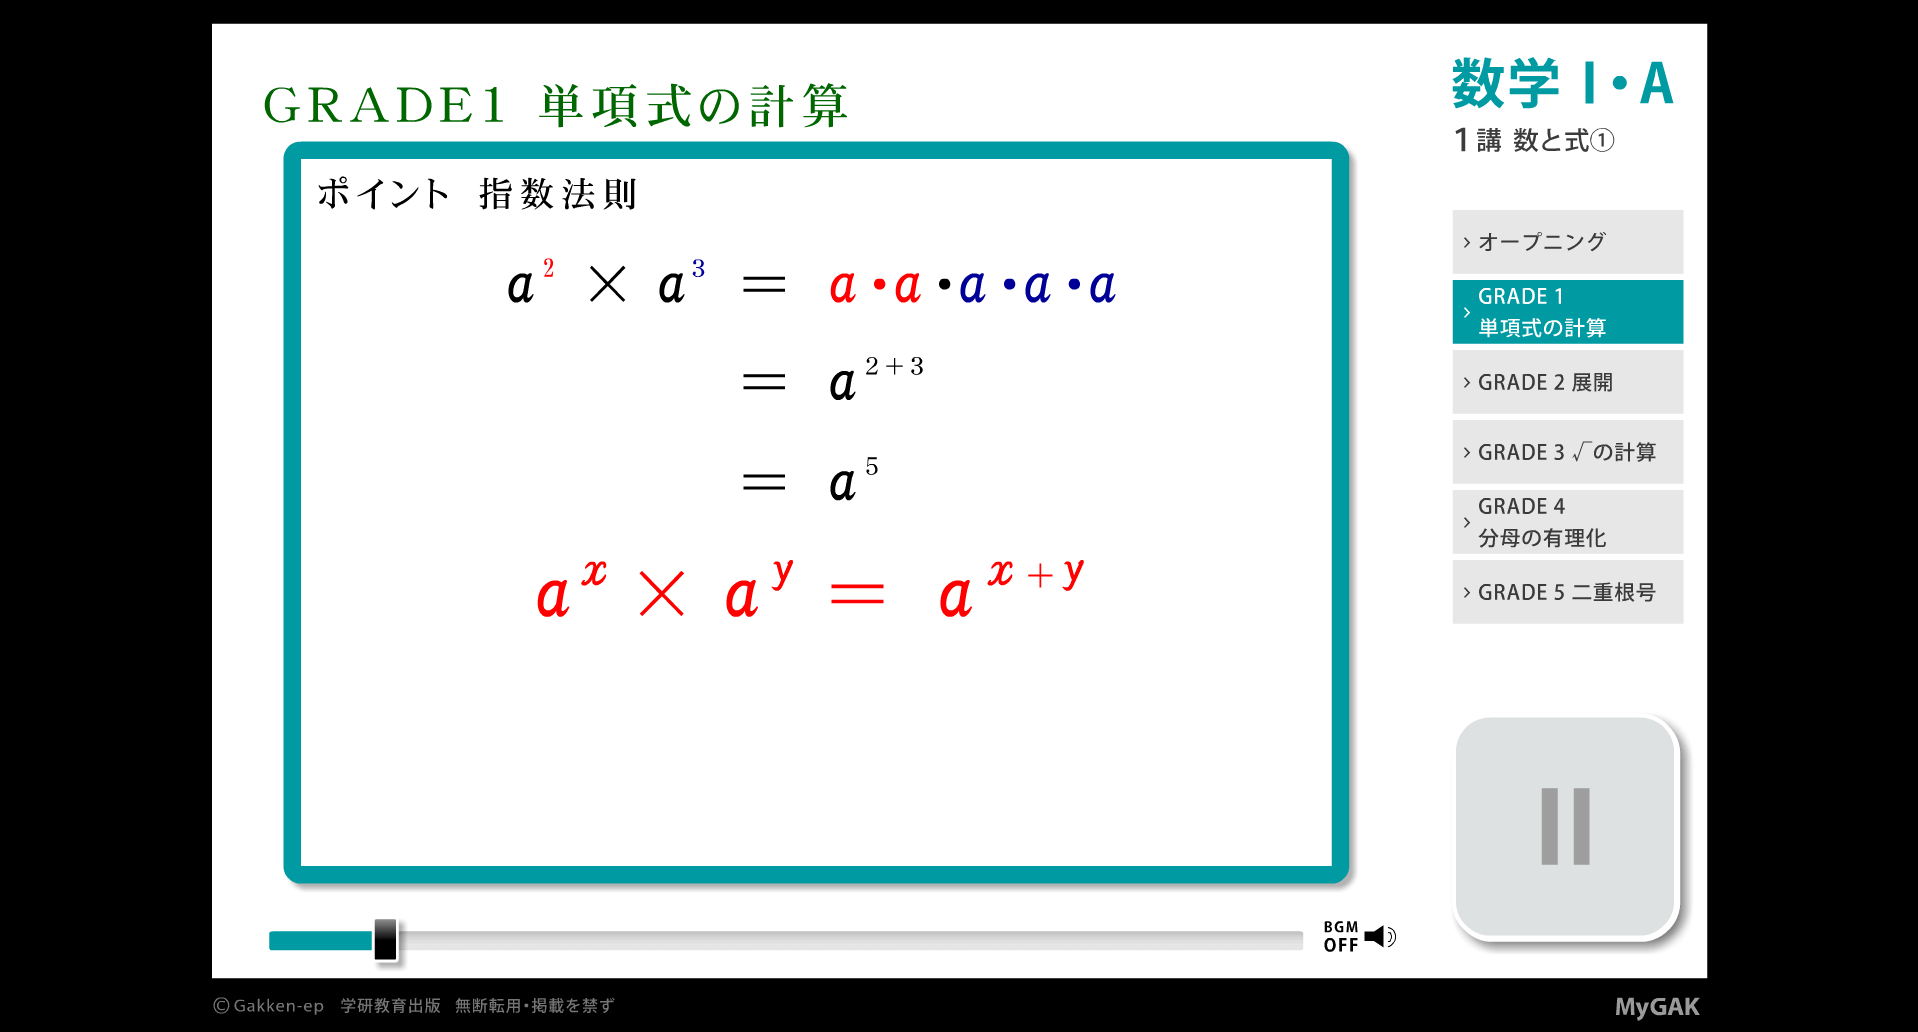 G-5 高校学力初級 数学Ⅰ・A